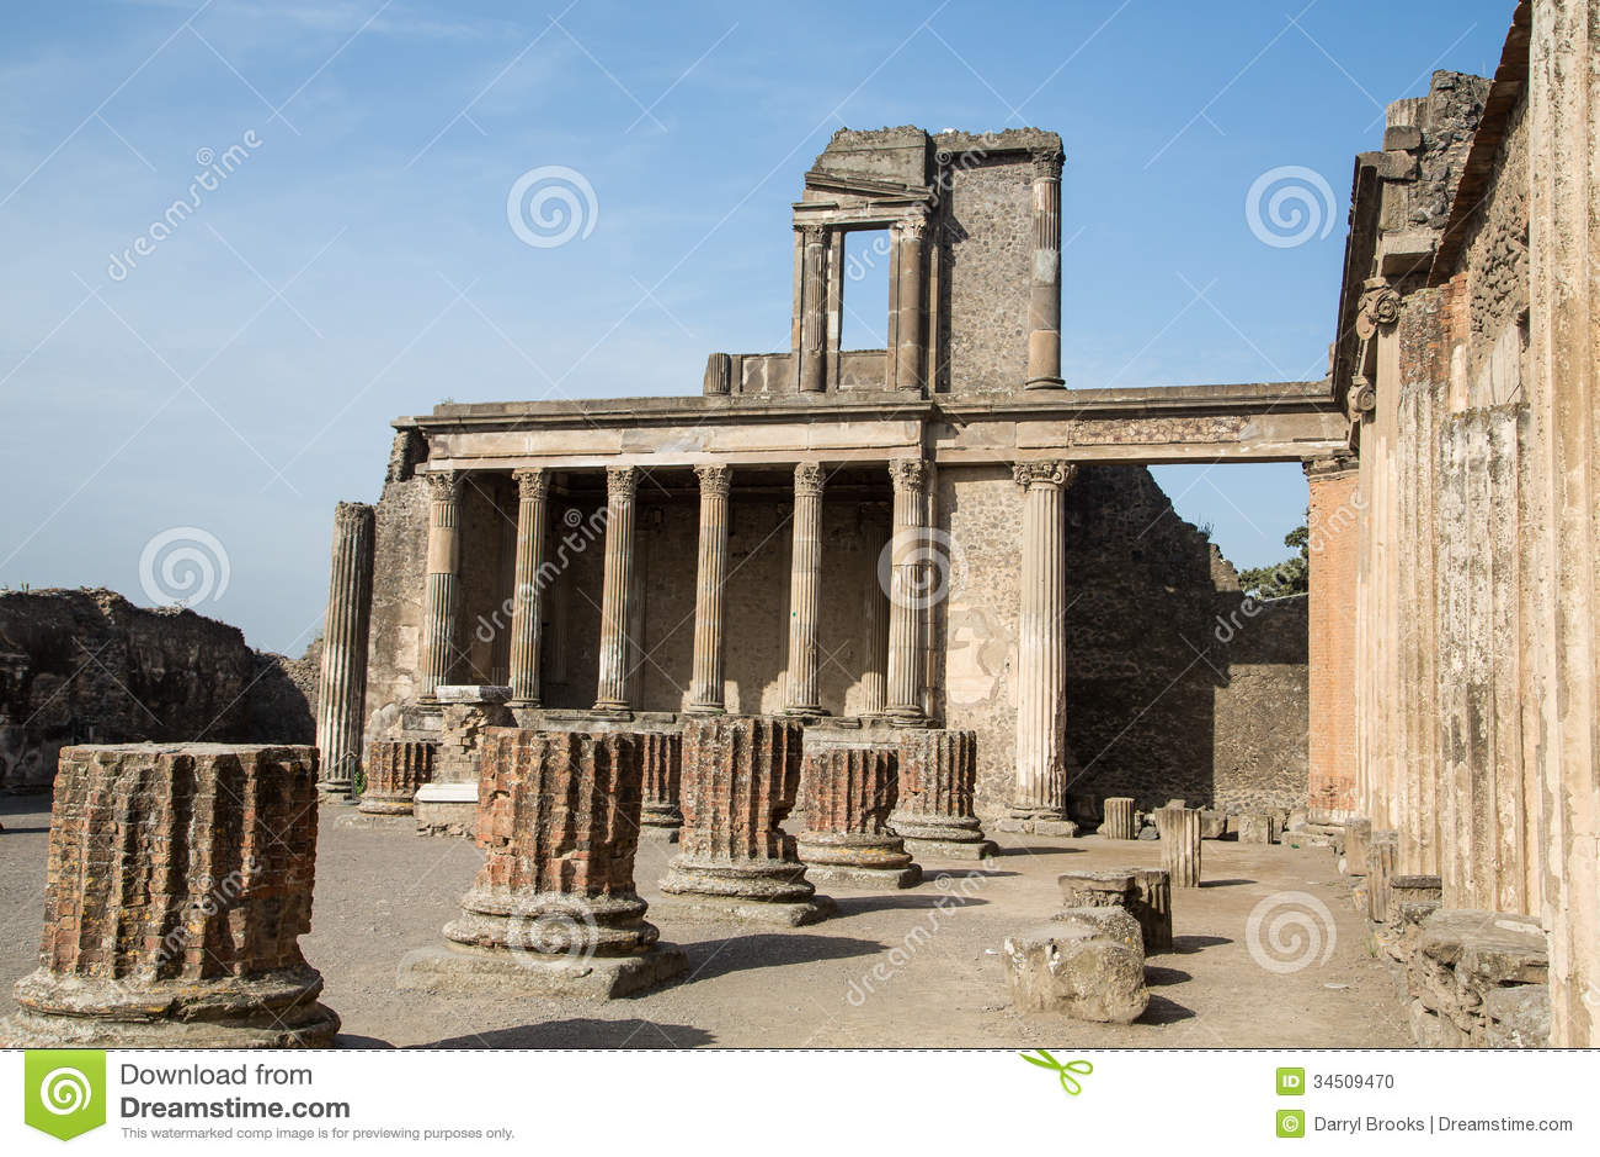 Broken Stone Pillar : Whole and broken columns in pompeii stock photo image